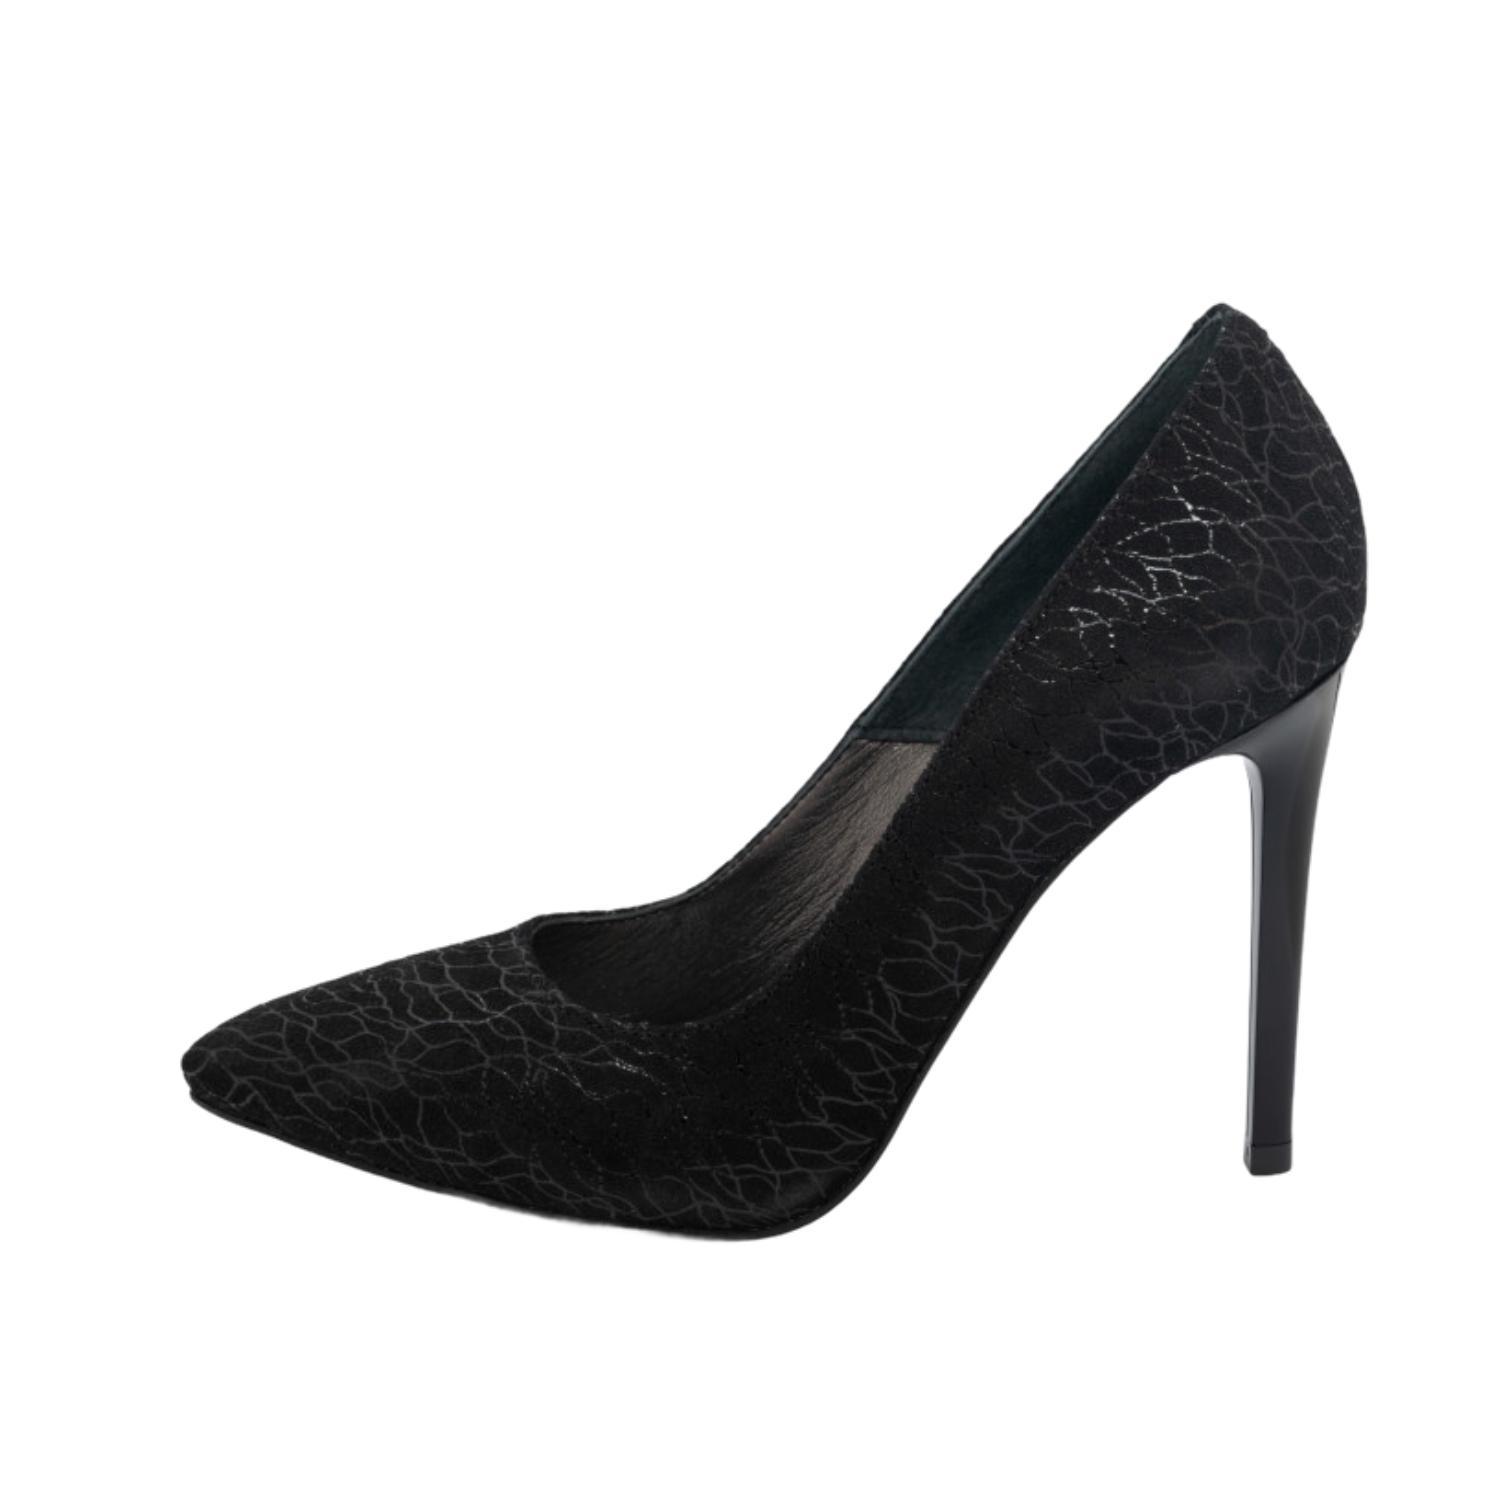 Pantofi negri cu model abstract argintiu